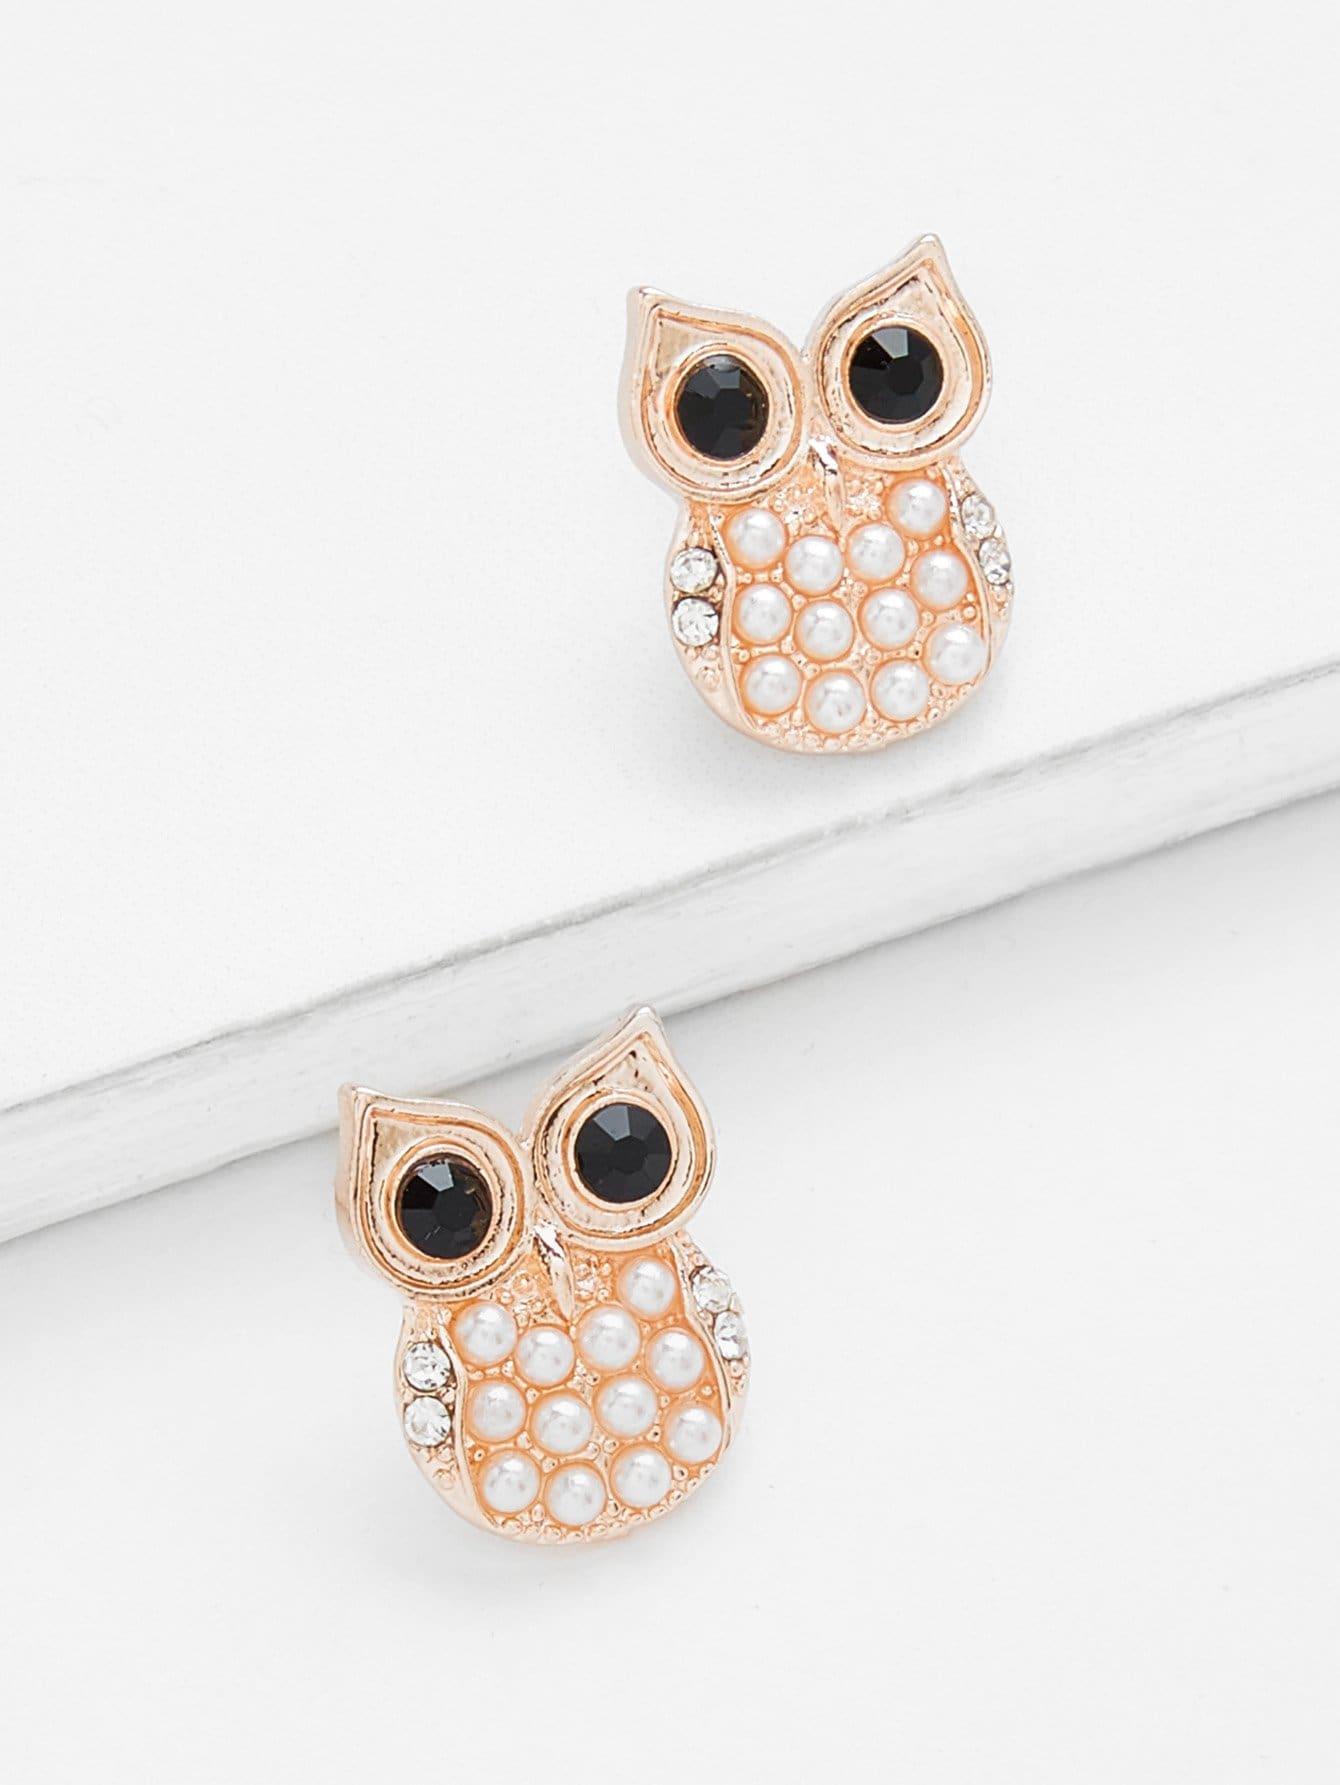 Owl Shaped Stud Earrings waterdrop shaped stud earrings